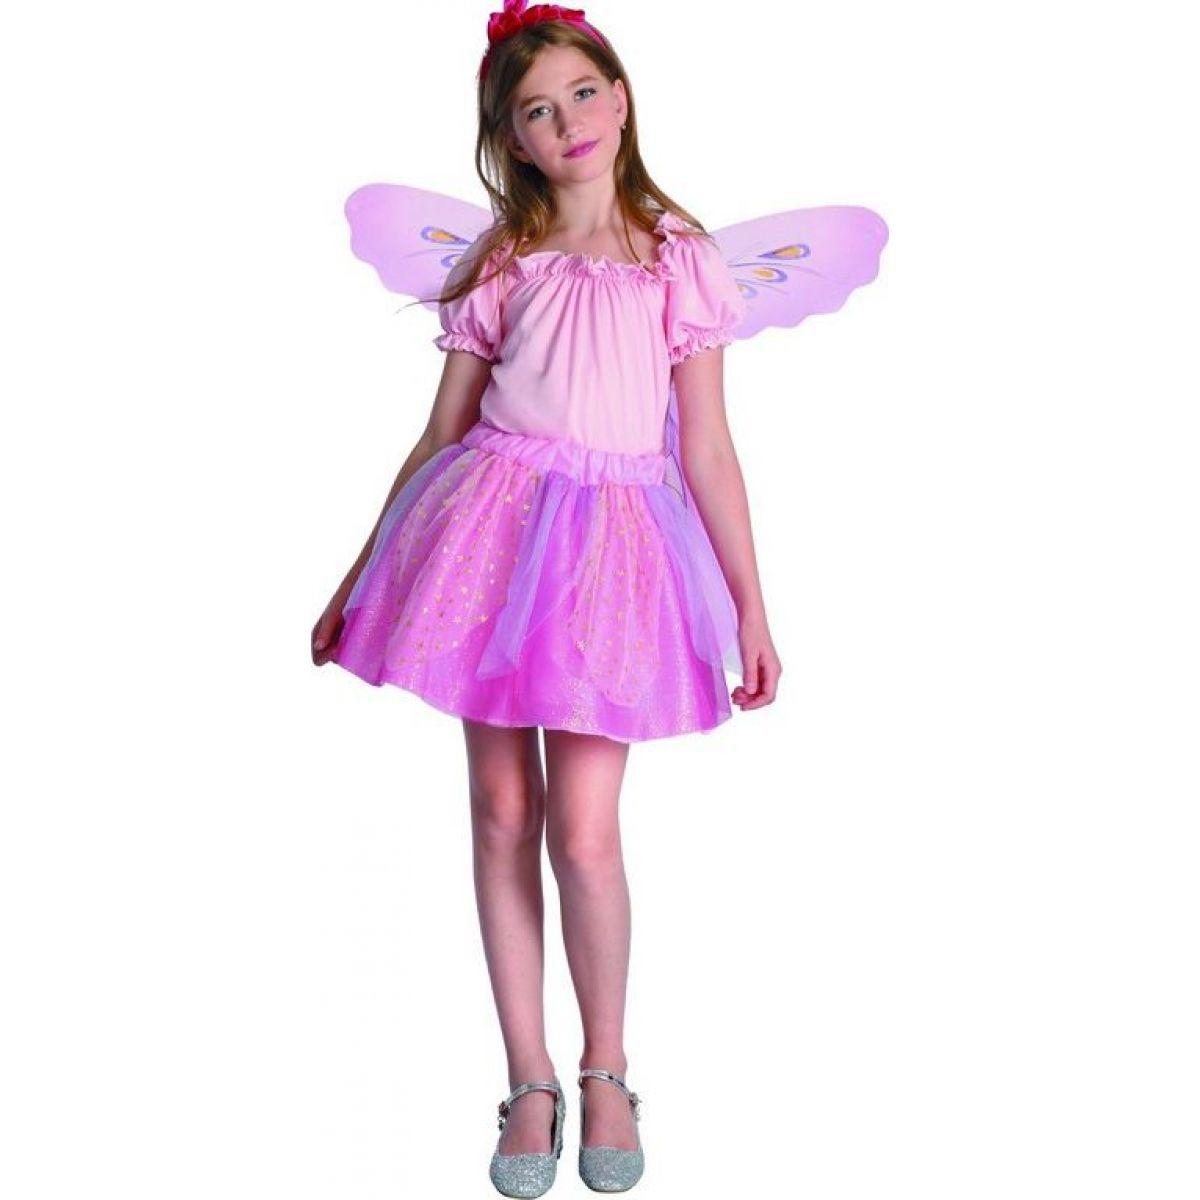 Dětský karnevalový kostým Víla 120-130 cm